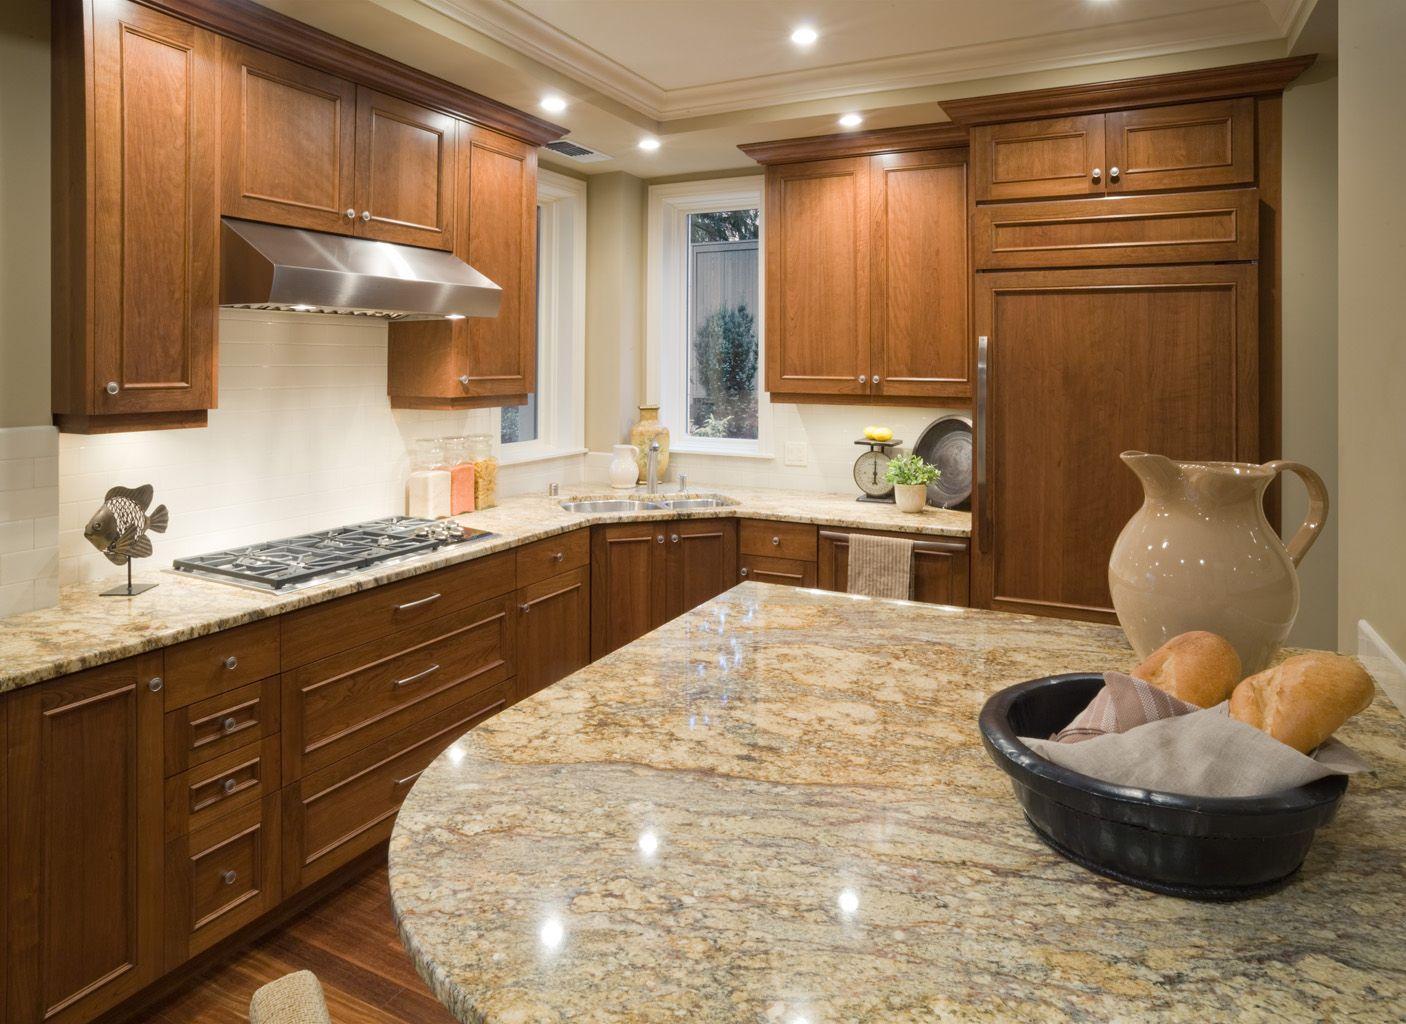 Golden River Granite Countertops Kitchen Ideas For Small Kitchens Golden  Crystal Granite Slab Golden River Granite Countertops